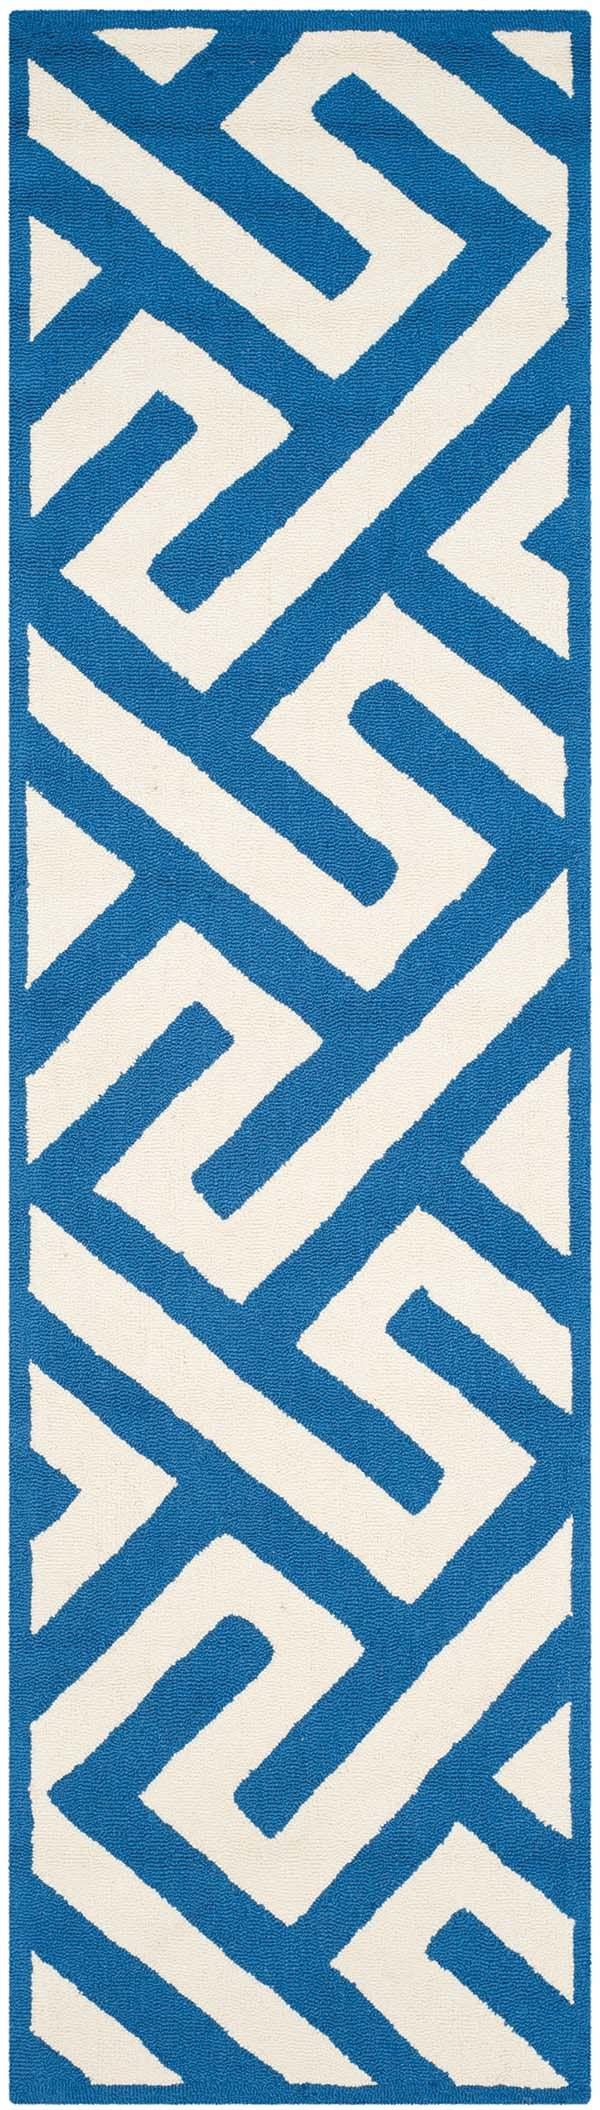 Ivory, Blue (K) Contemporary / Modern Area Rug